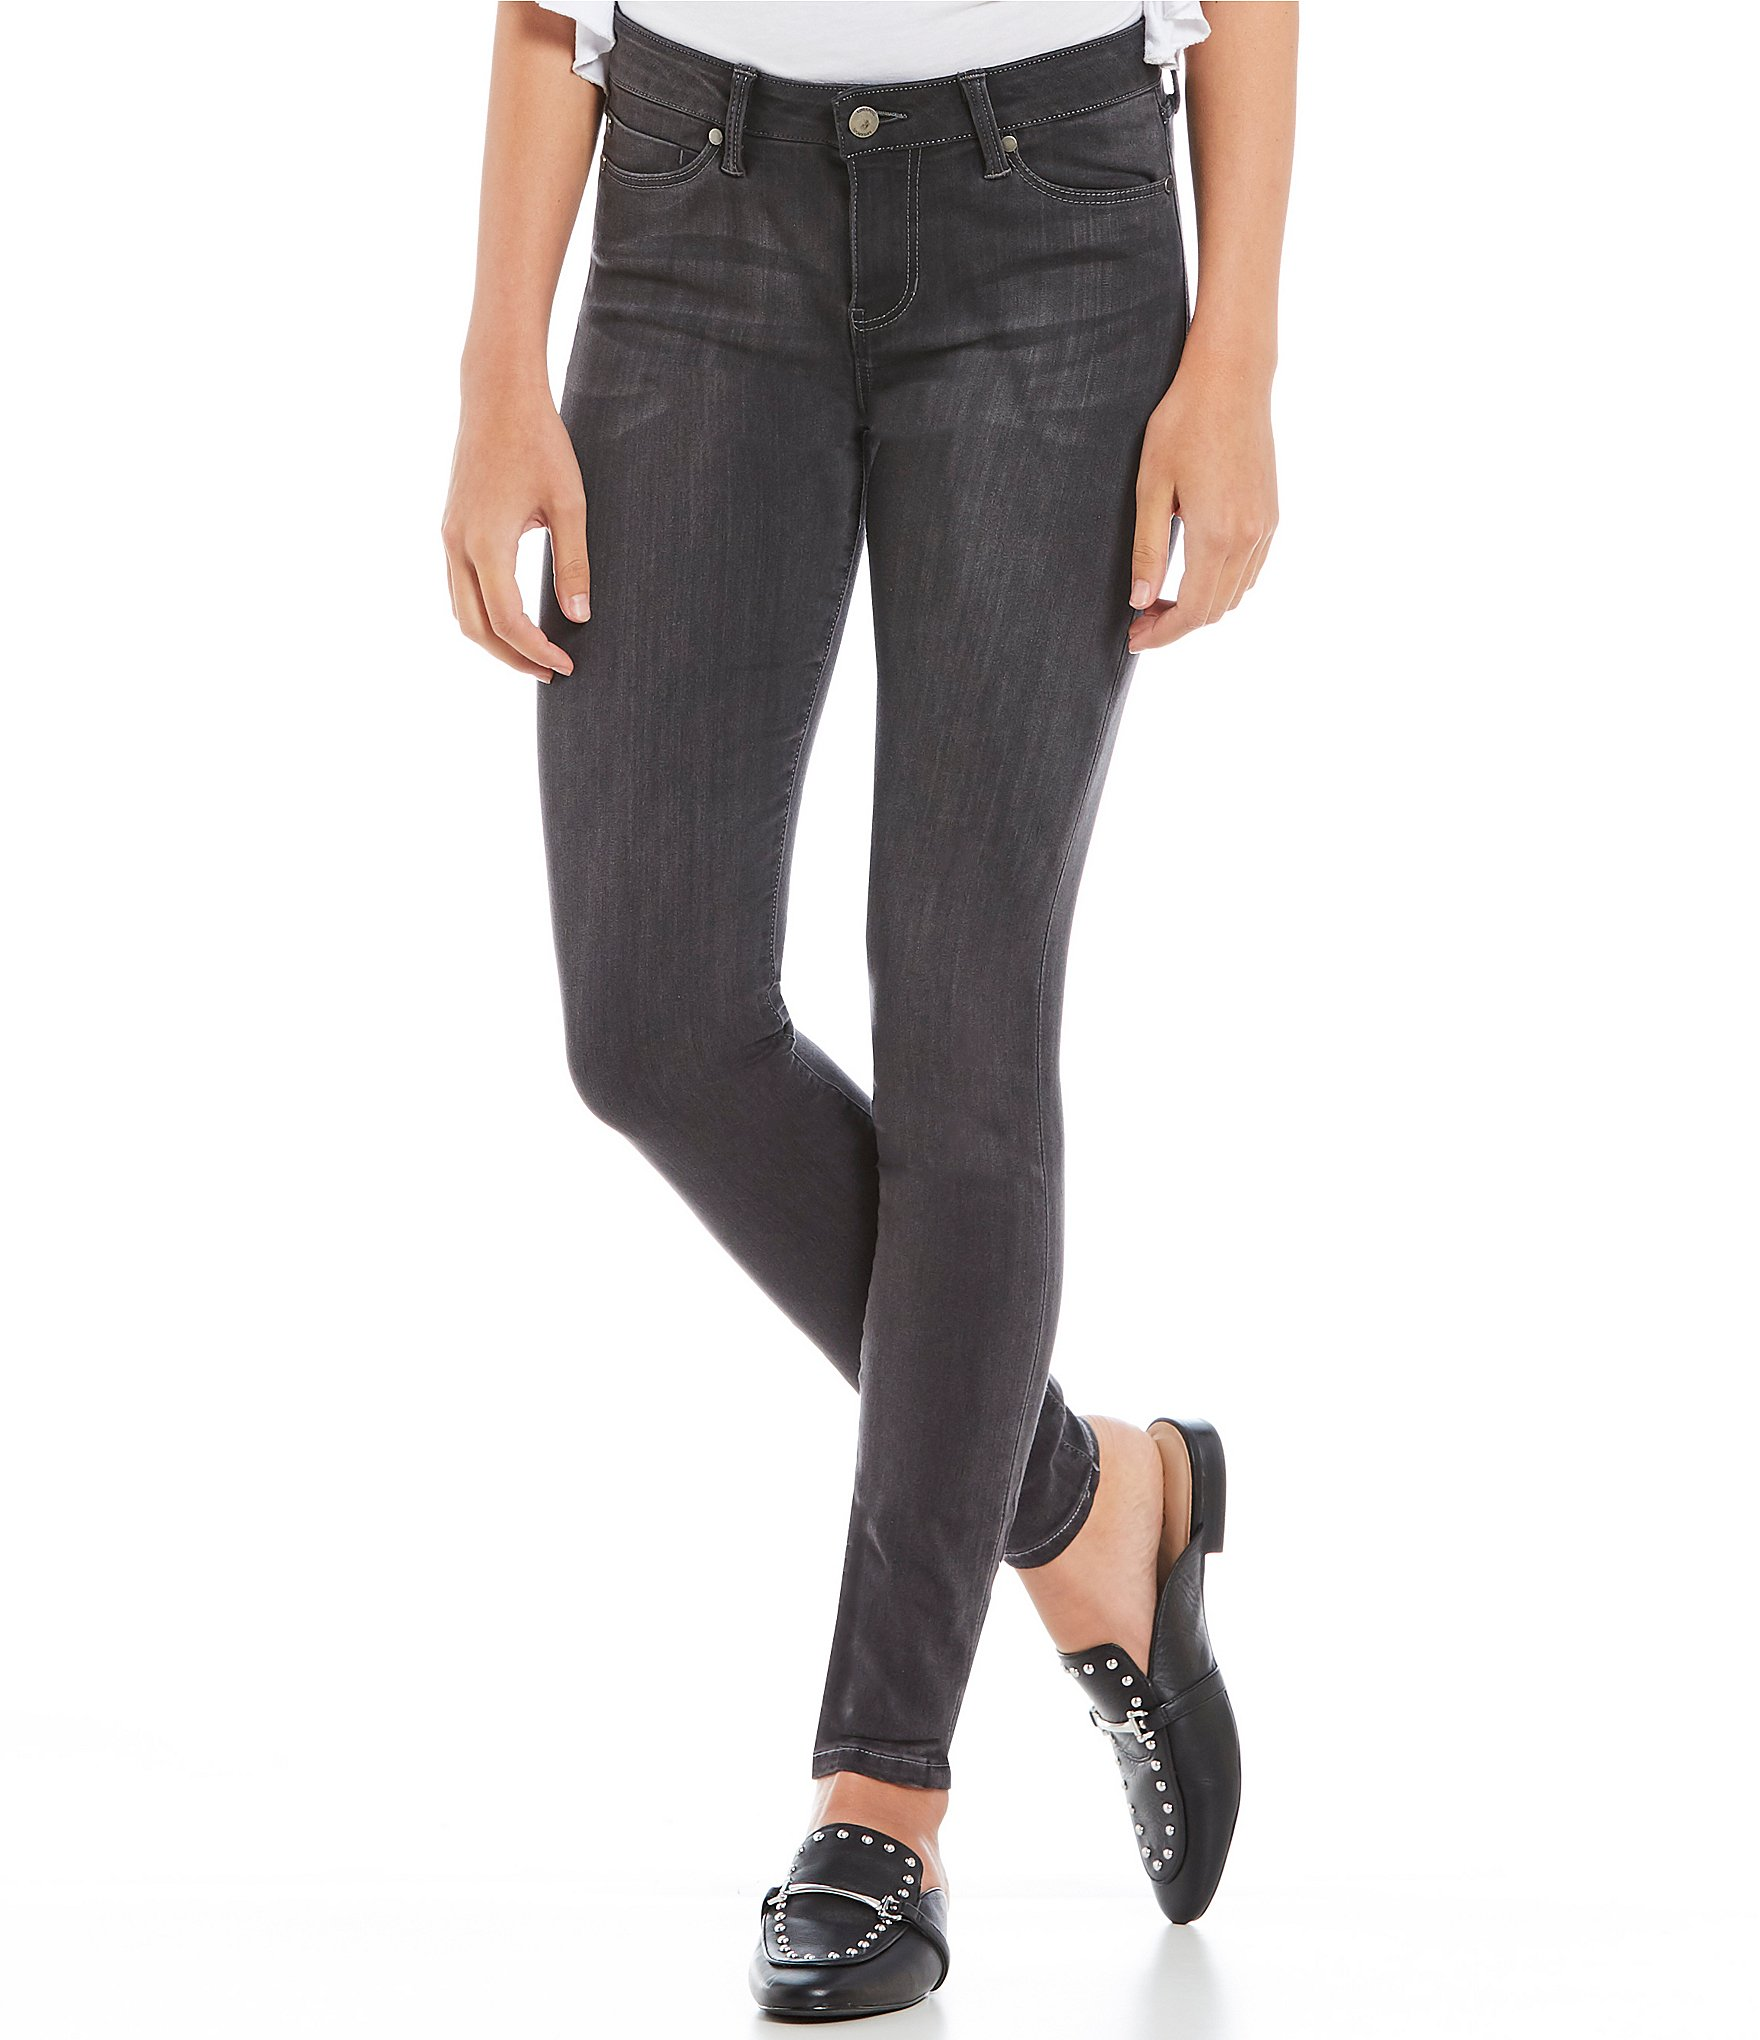 3e2e2395ca2d5 Liverpool Jeans Company Abby Skinny Jeans | Dillard's